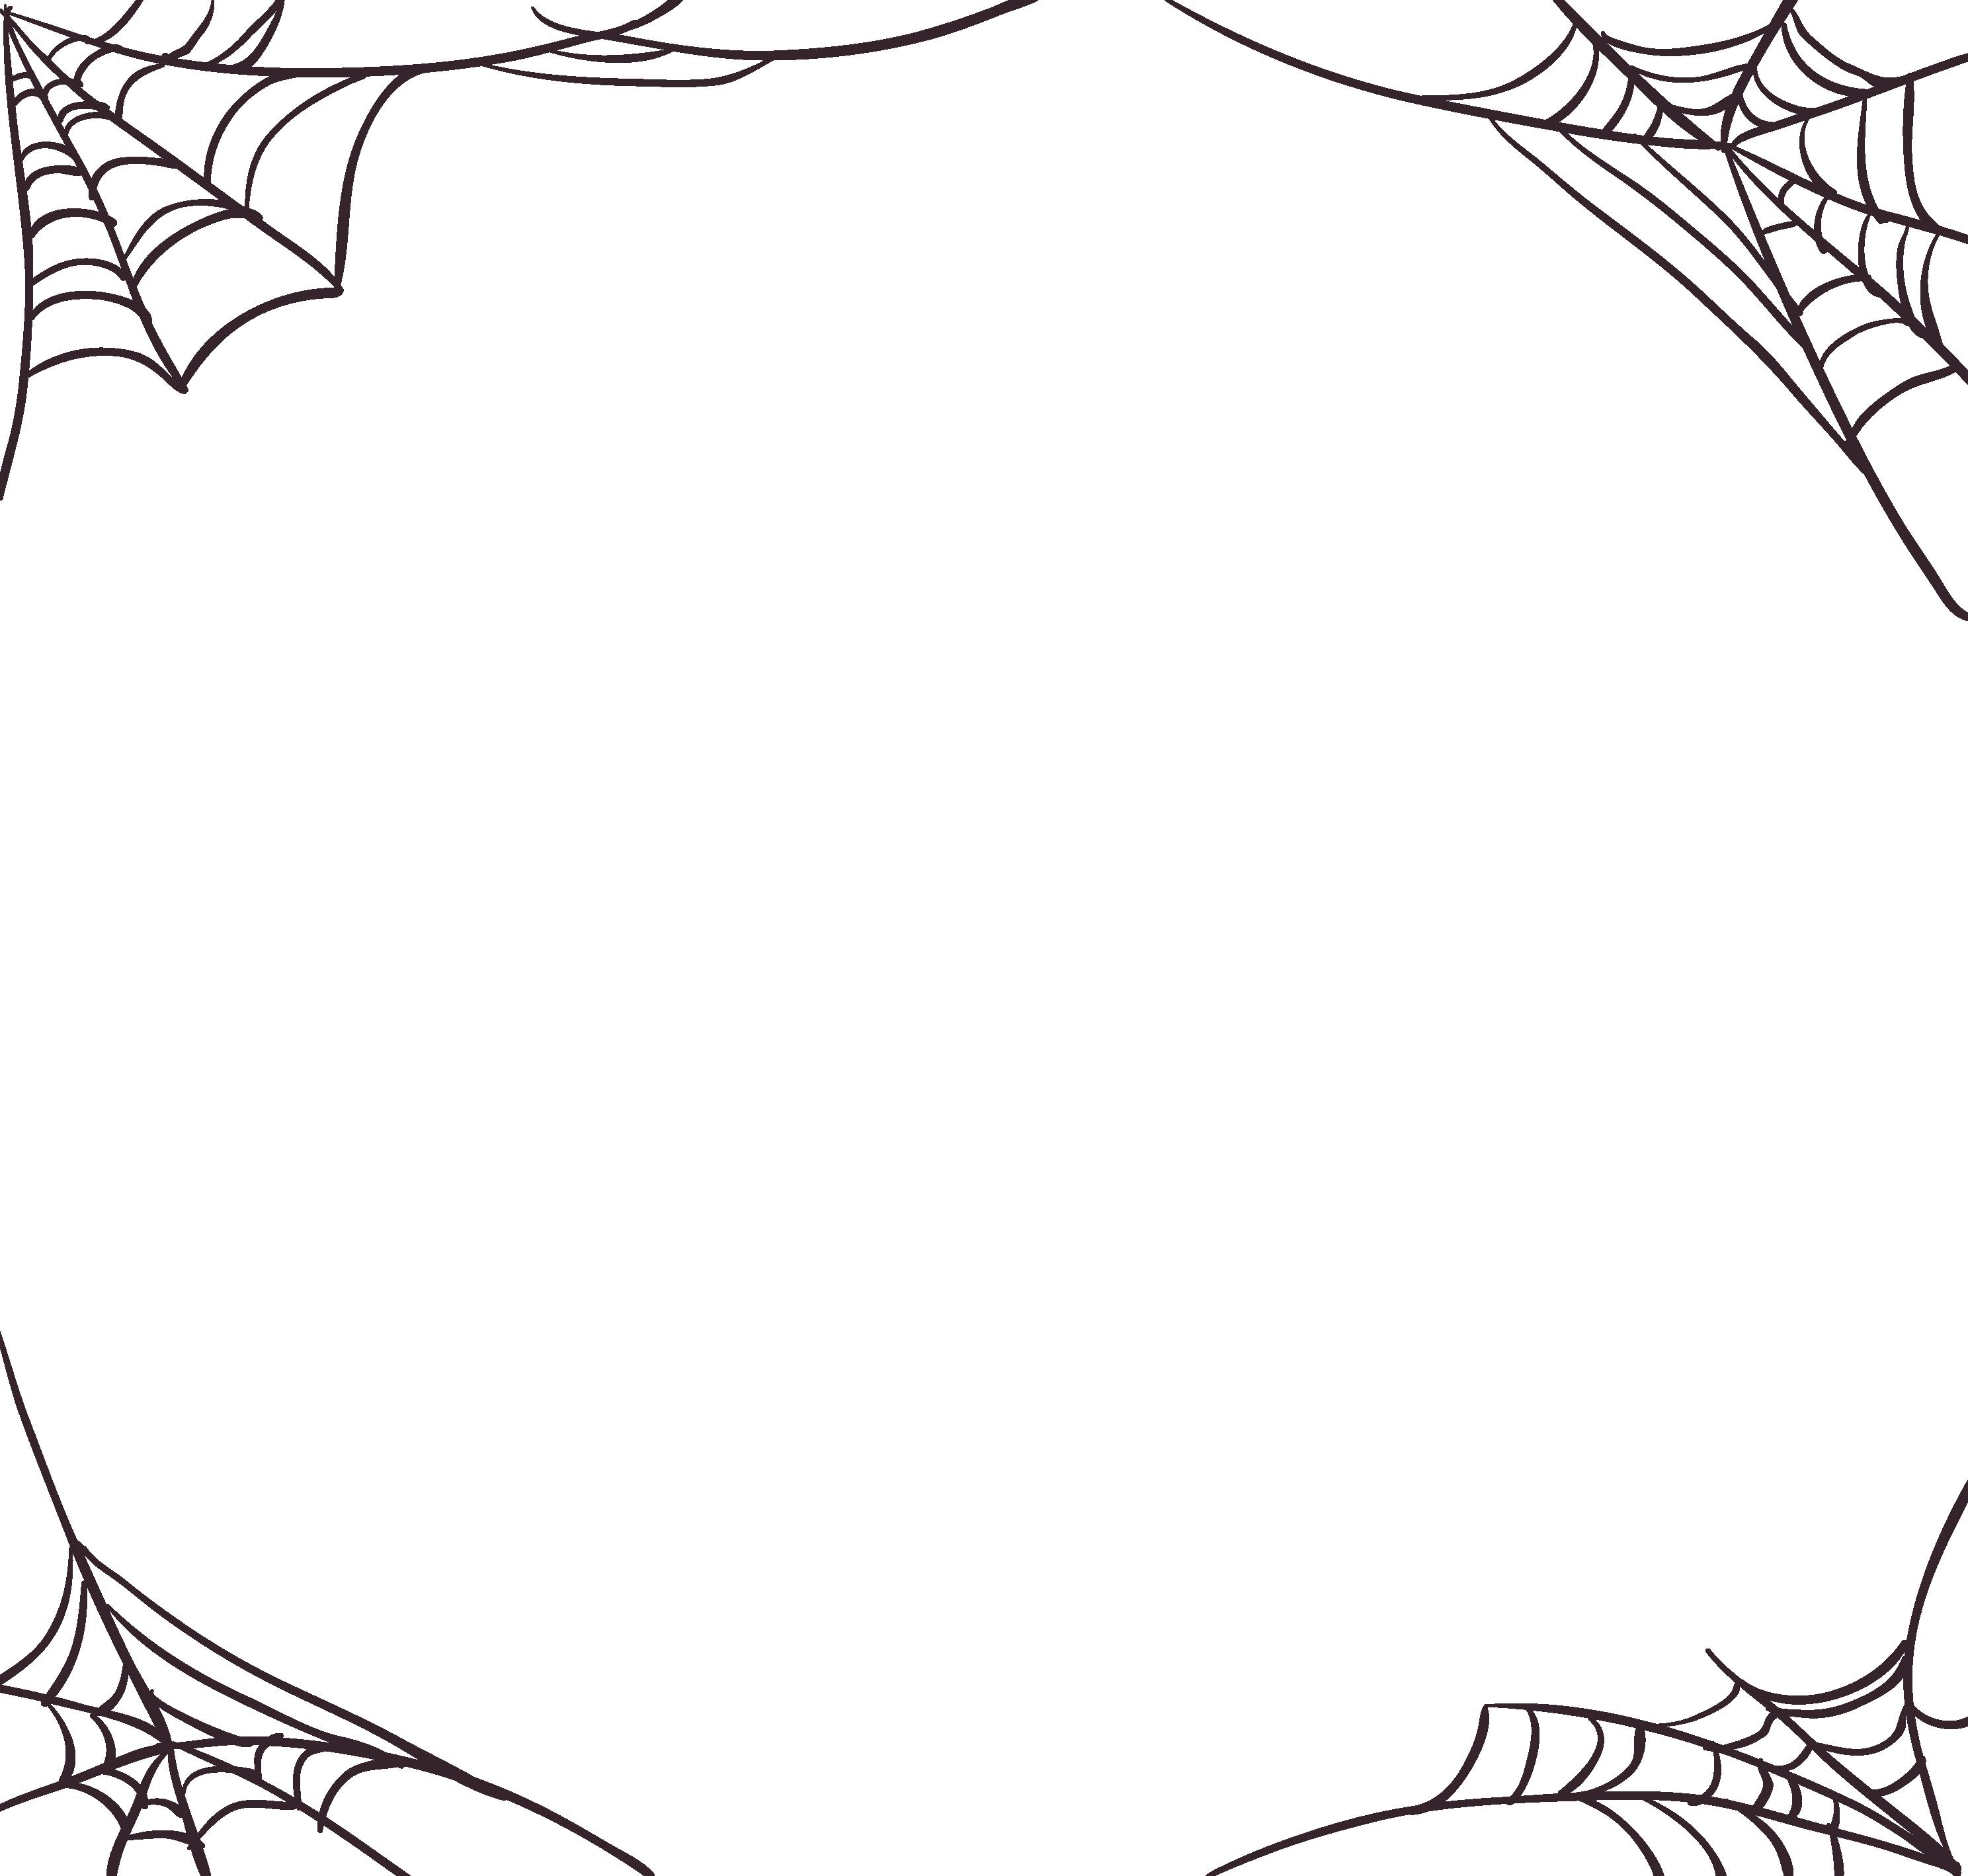 transparent library Mq spiderweb halloween borders. Spider web border clipart